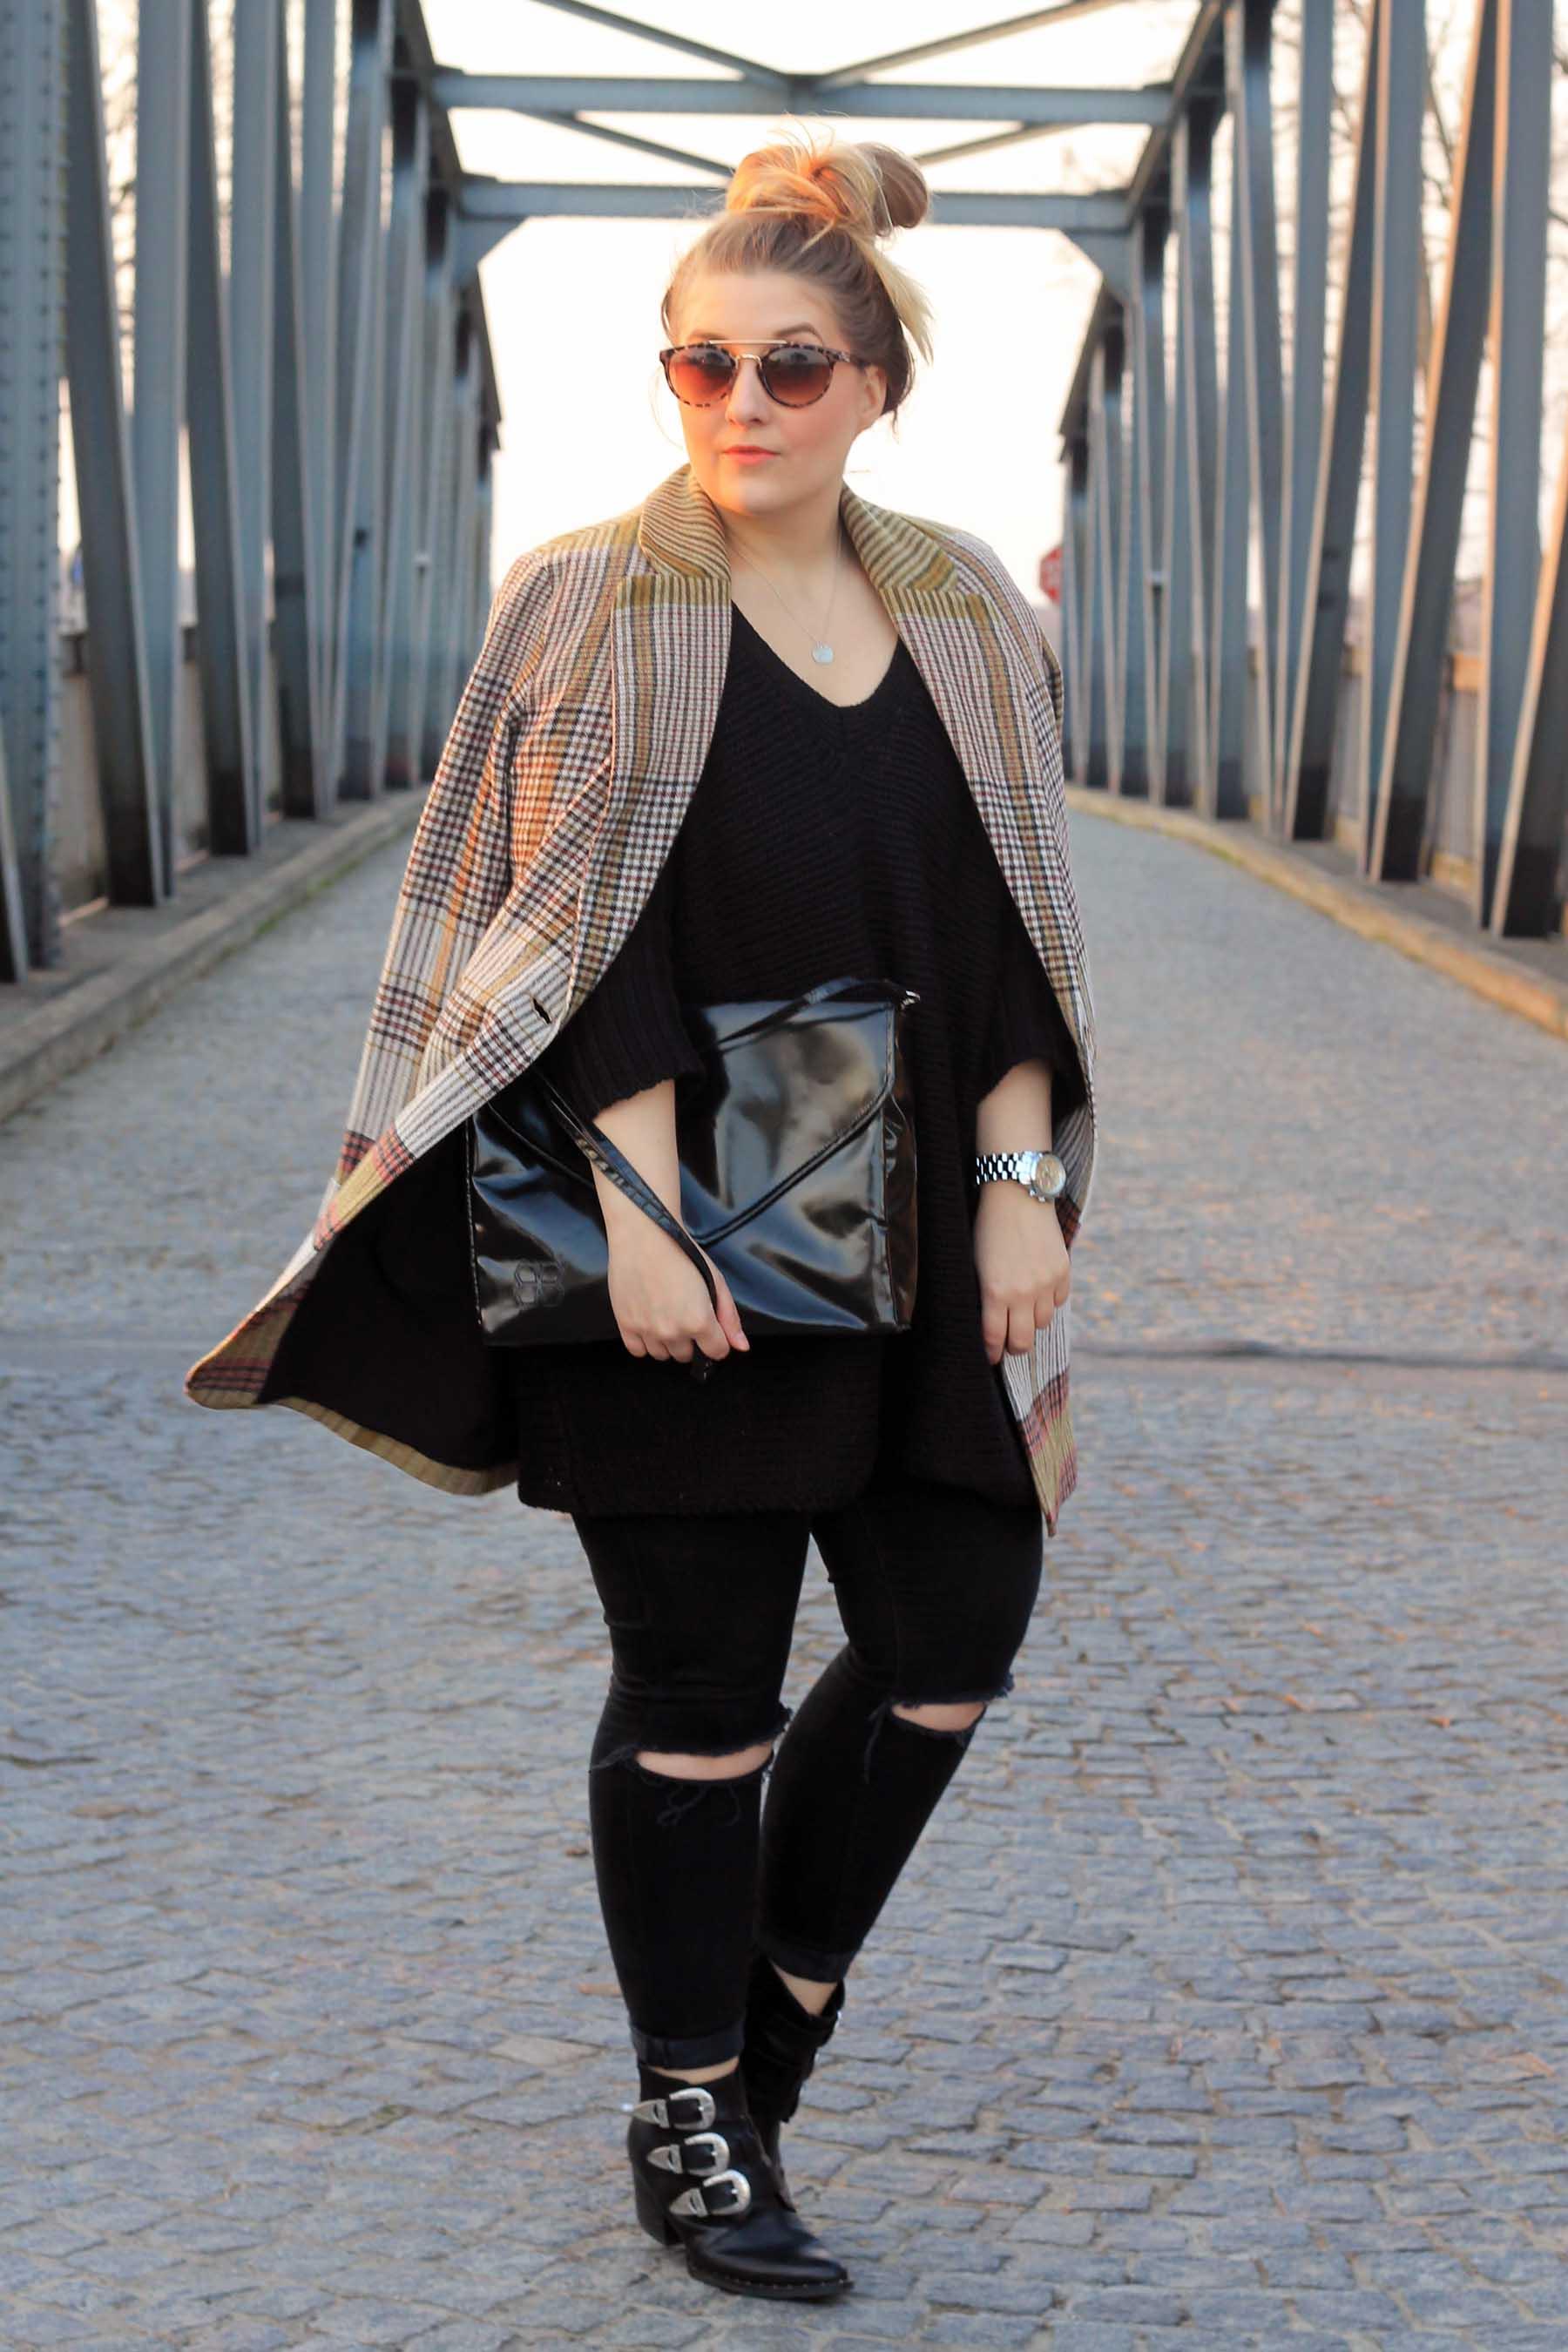 2-outfit-modeblog-fashionblog-top-berlin-mantel-kariert-boots